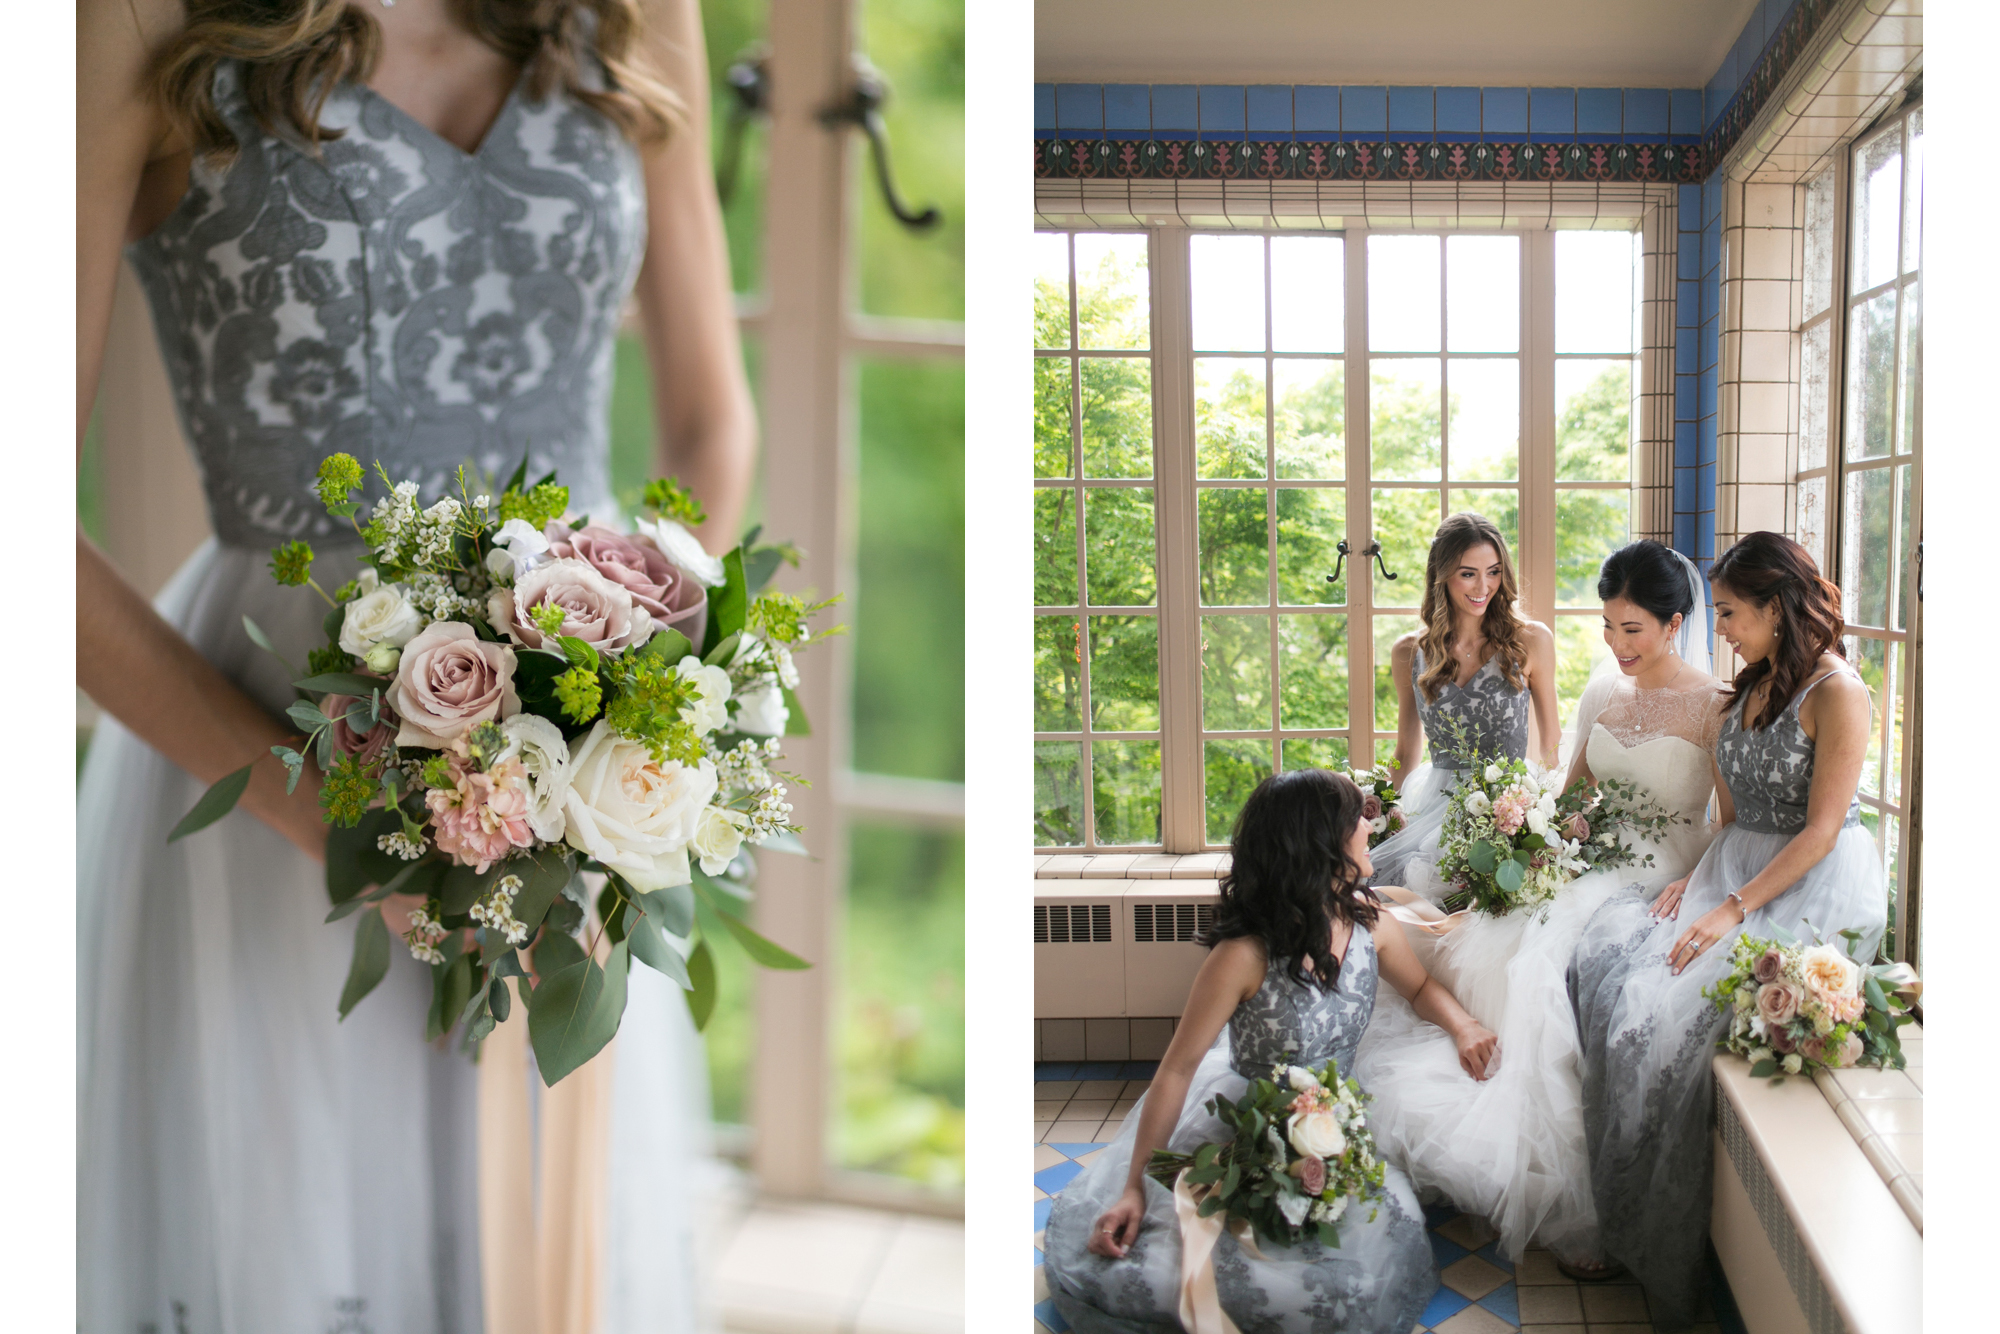 vancouver-luxury-wedding-photographer-lori-miles-2.jpg